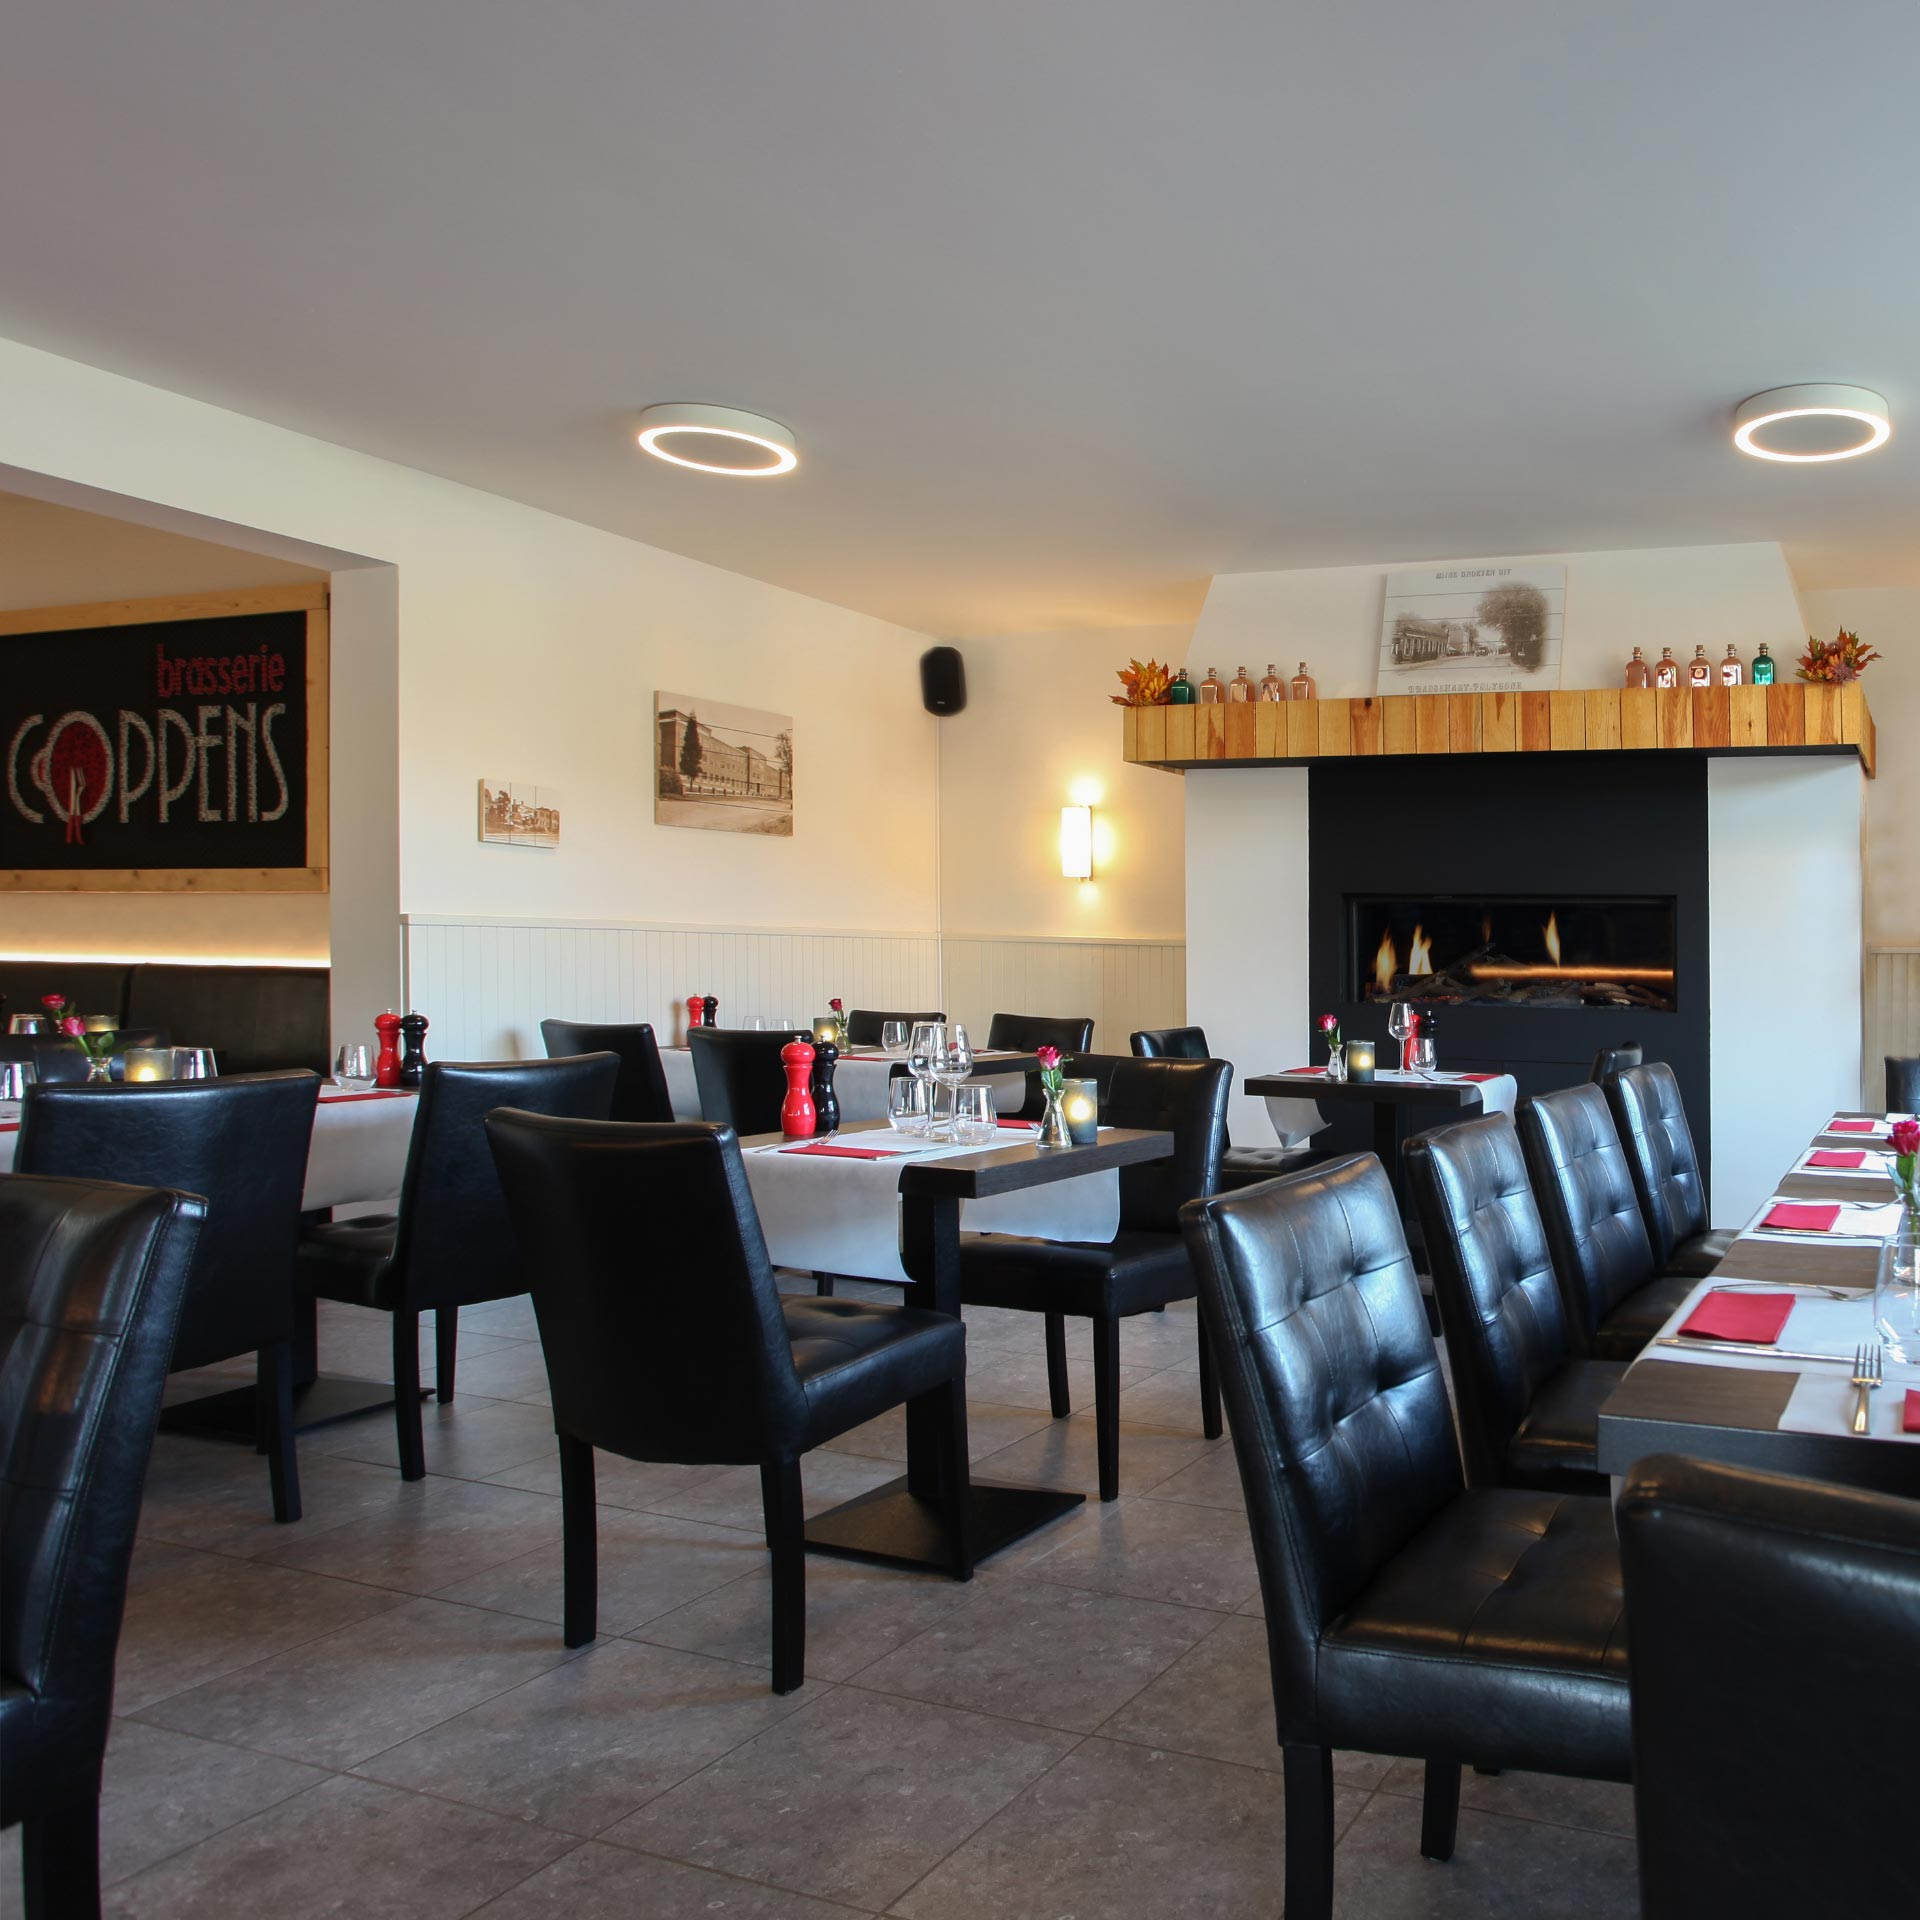 Interieur Brasserie Coppens